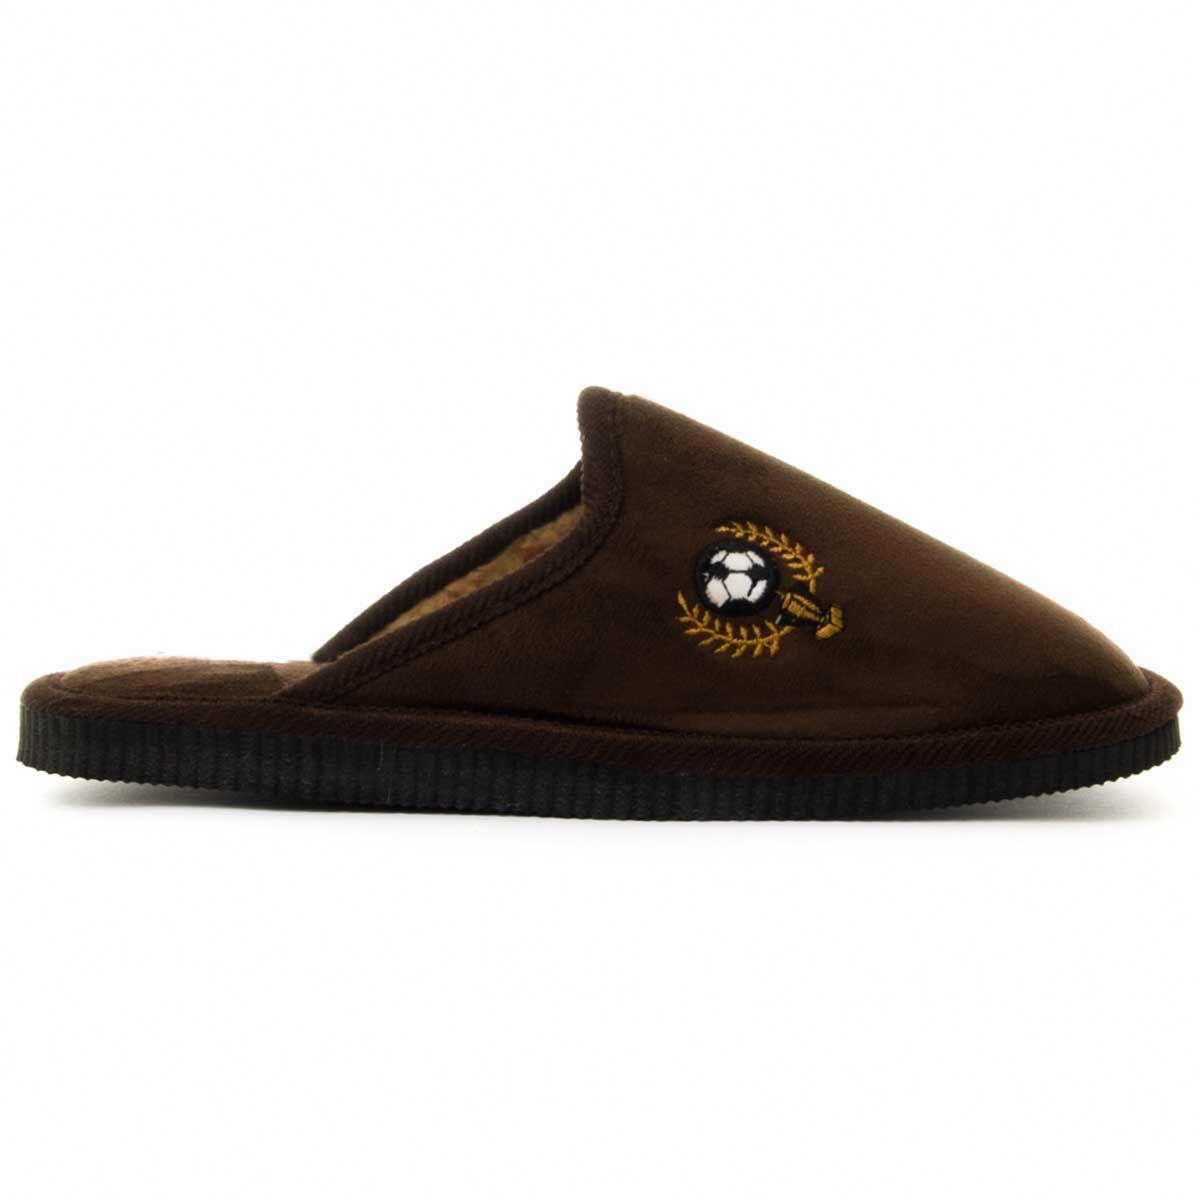 Montevita Comfortable Slipper in Brown